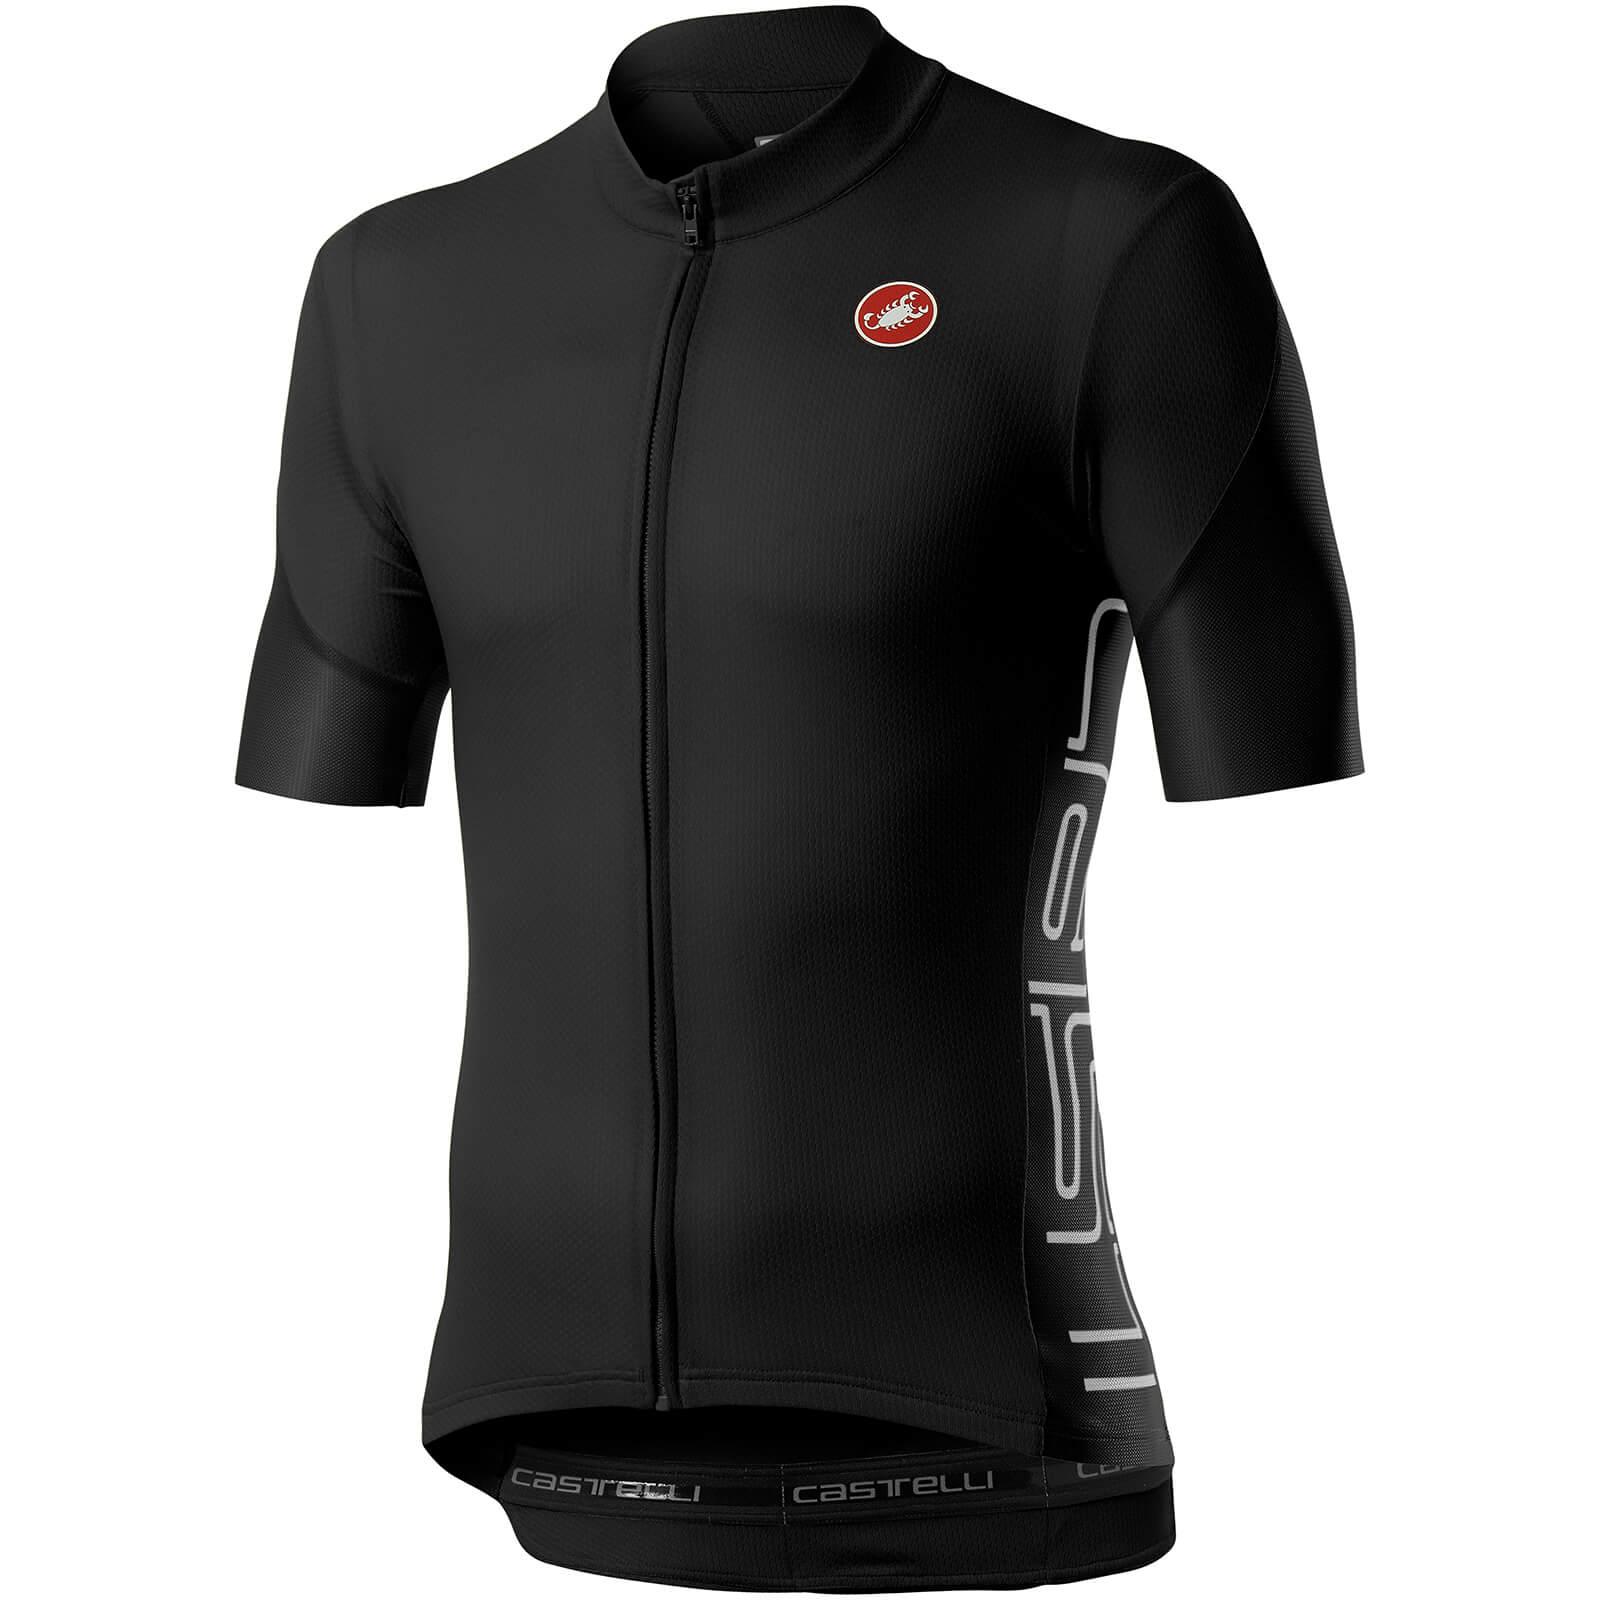 Castelli Entrata V Jersey - XL - Light Black